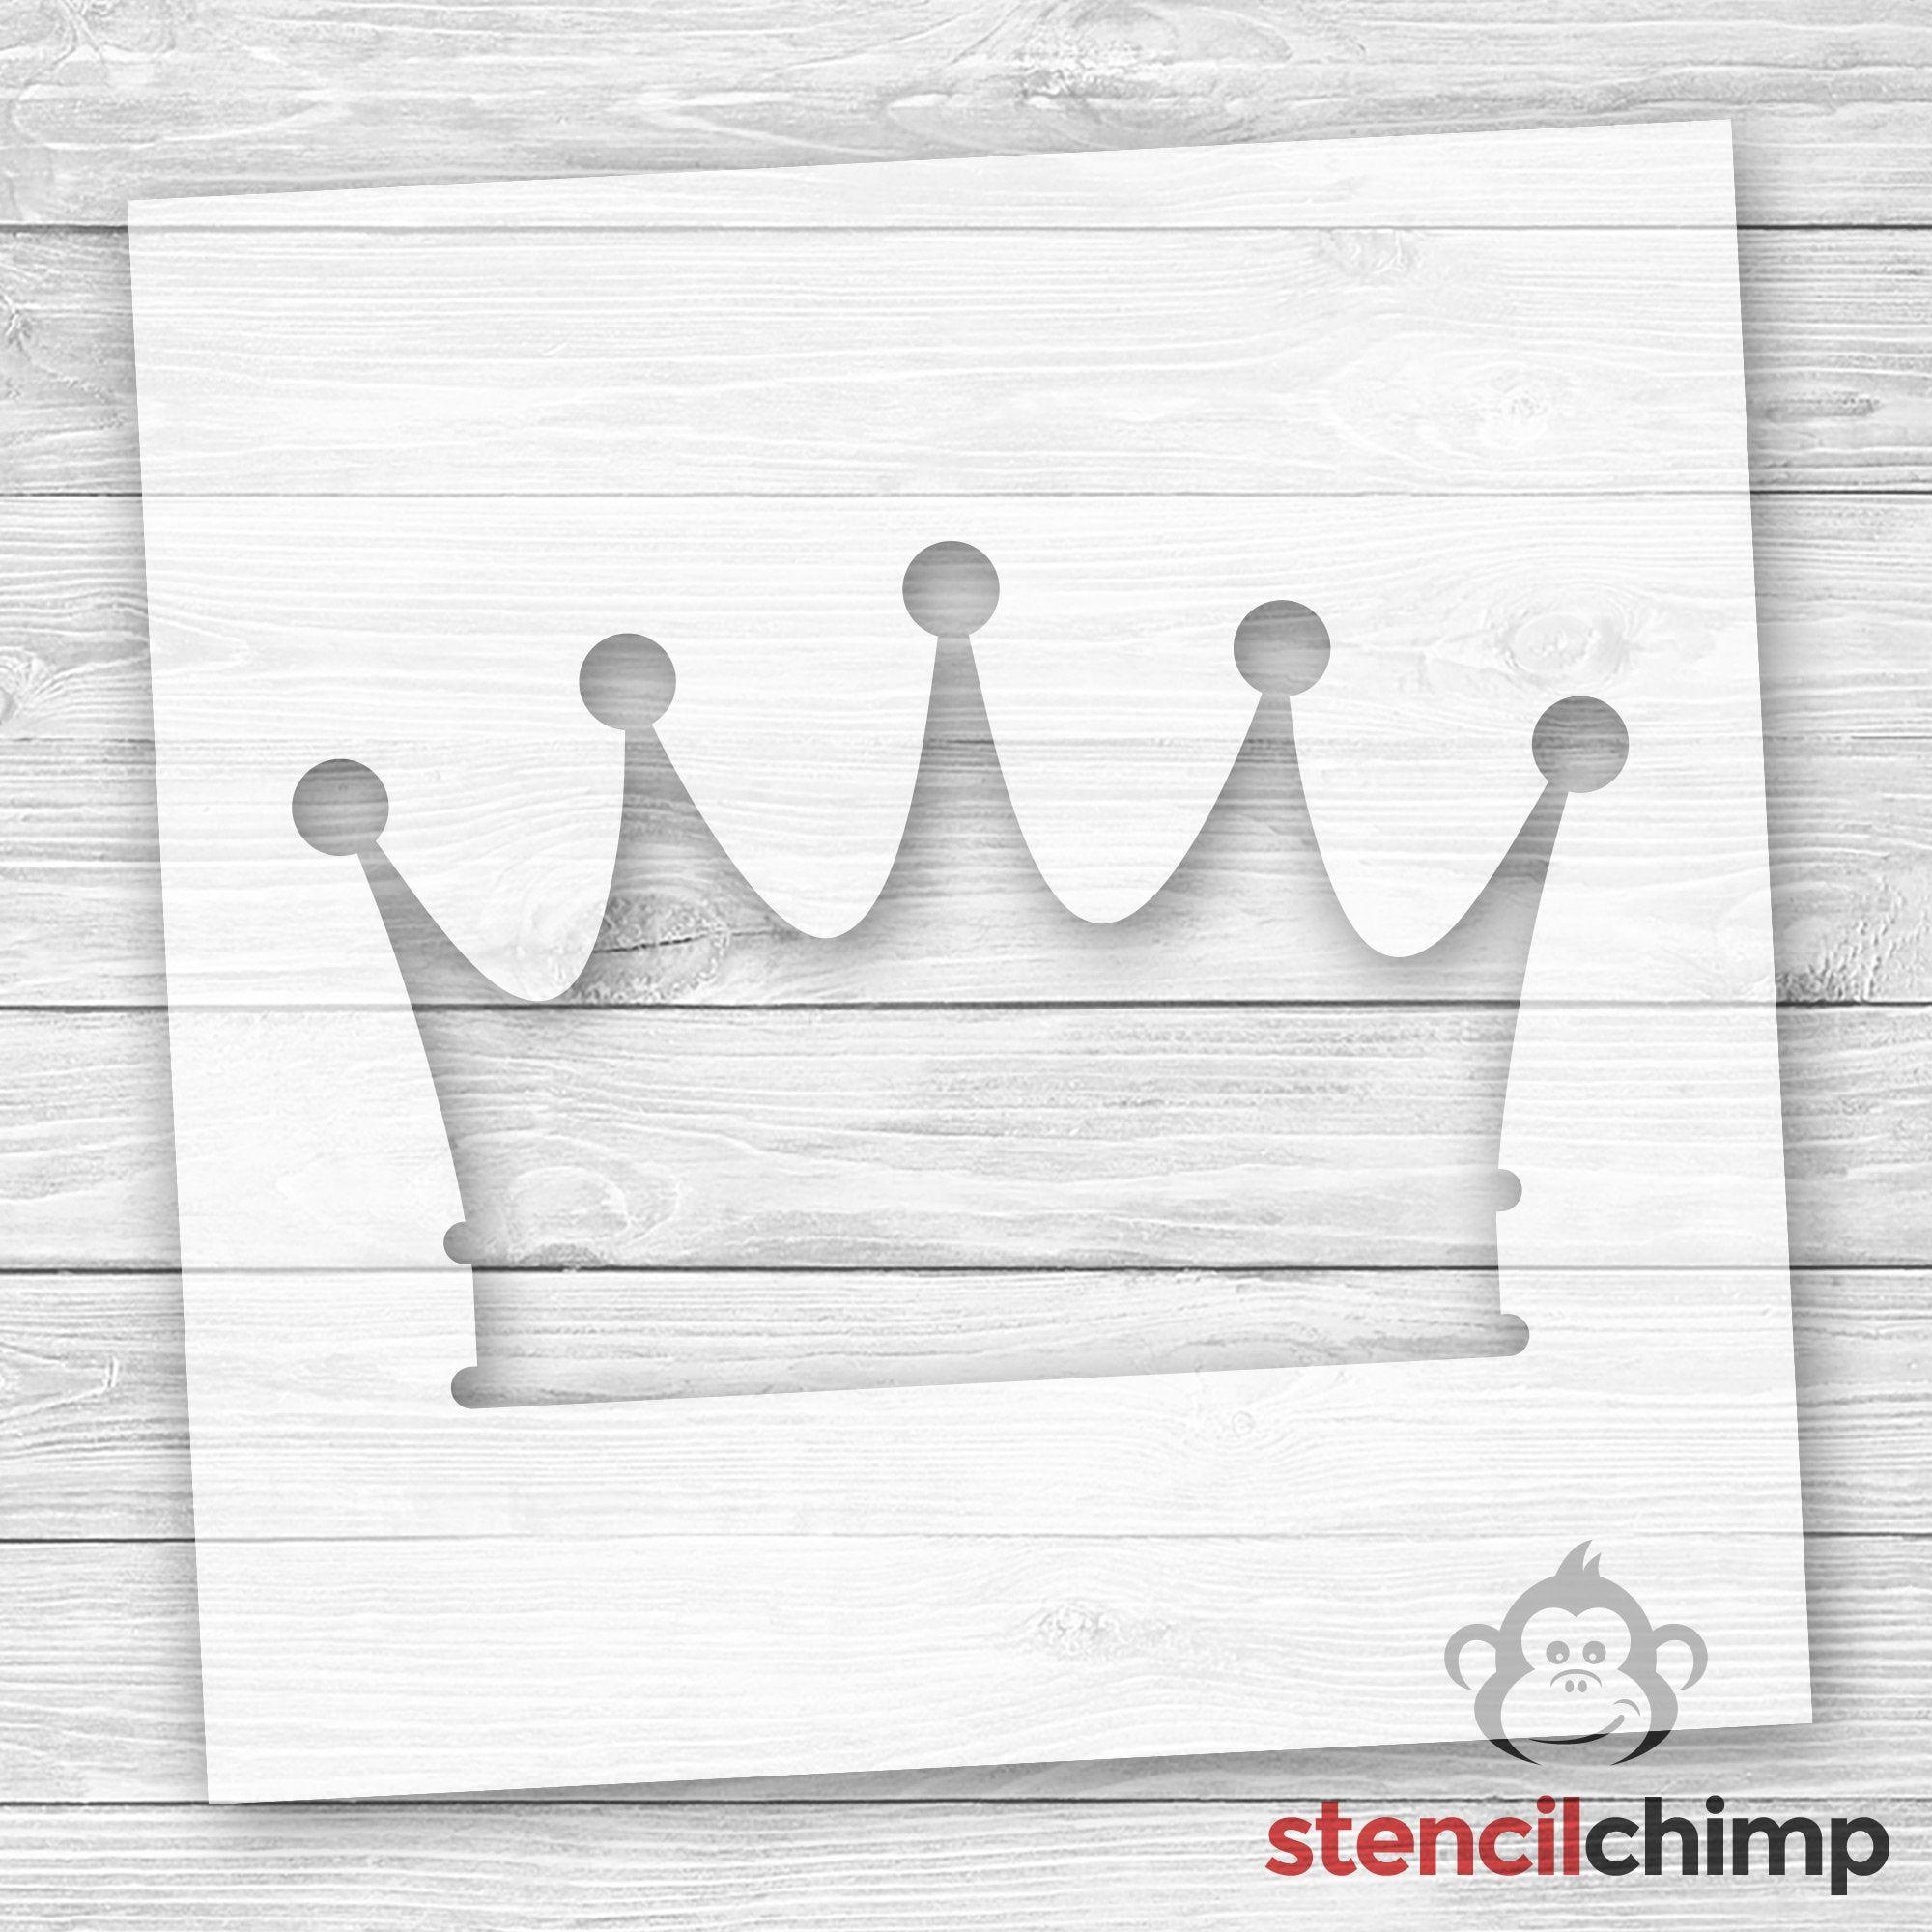 Crown Stencil Prince Stencil Princess Stencil Bathroom